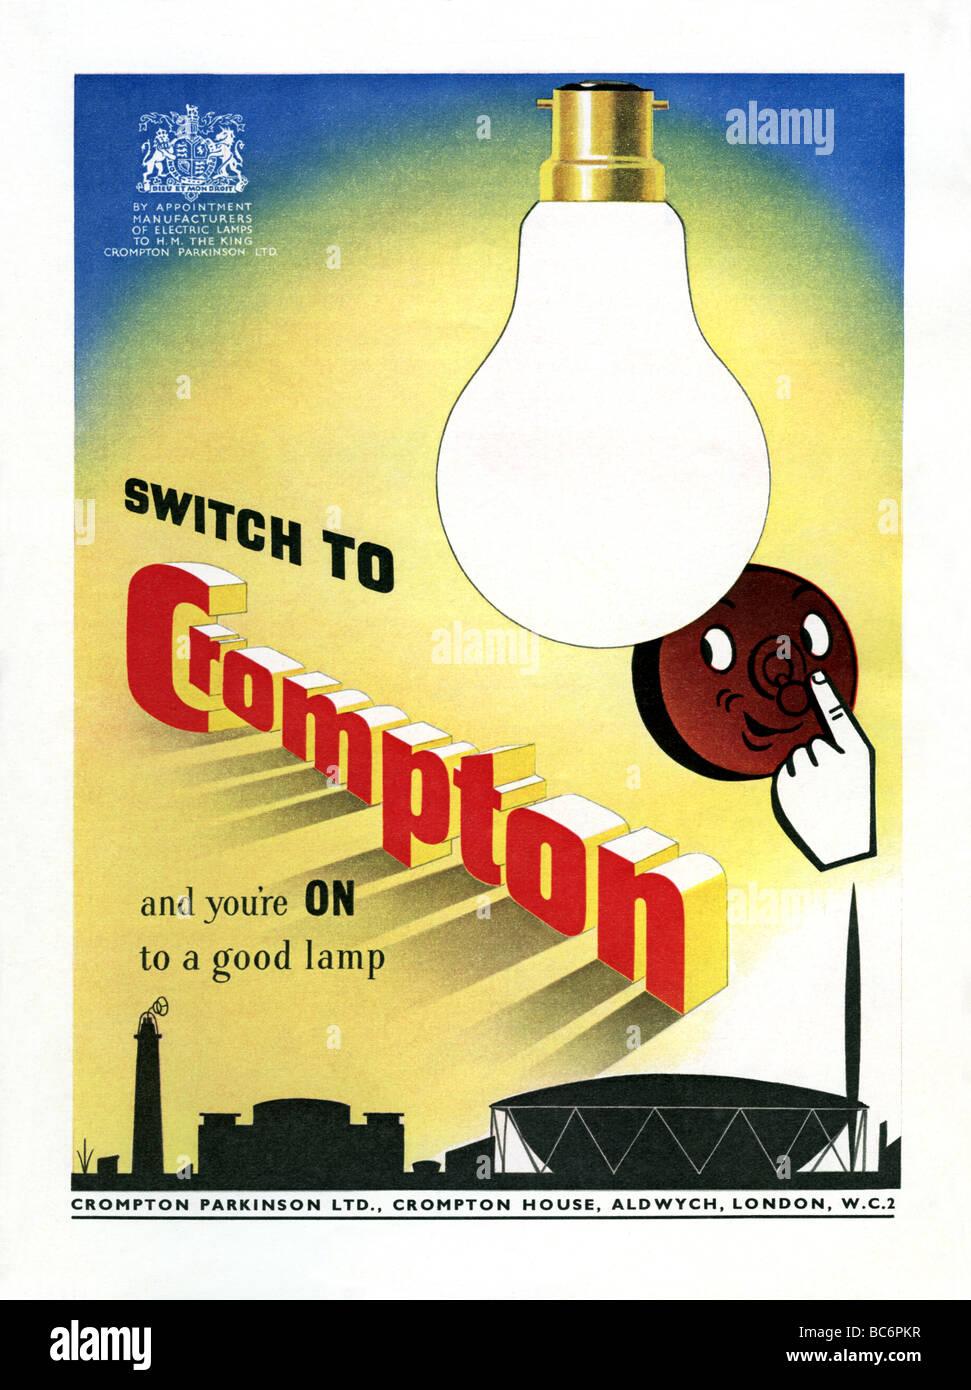 1951 colour advertisement for British lighting company Crompton Parkinson - Stock Image